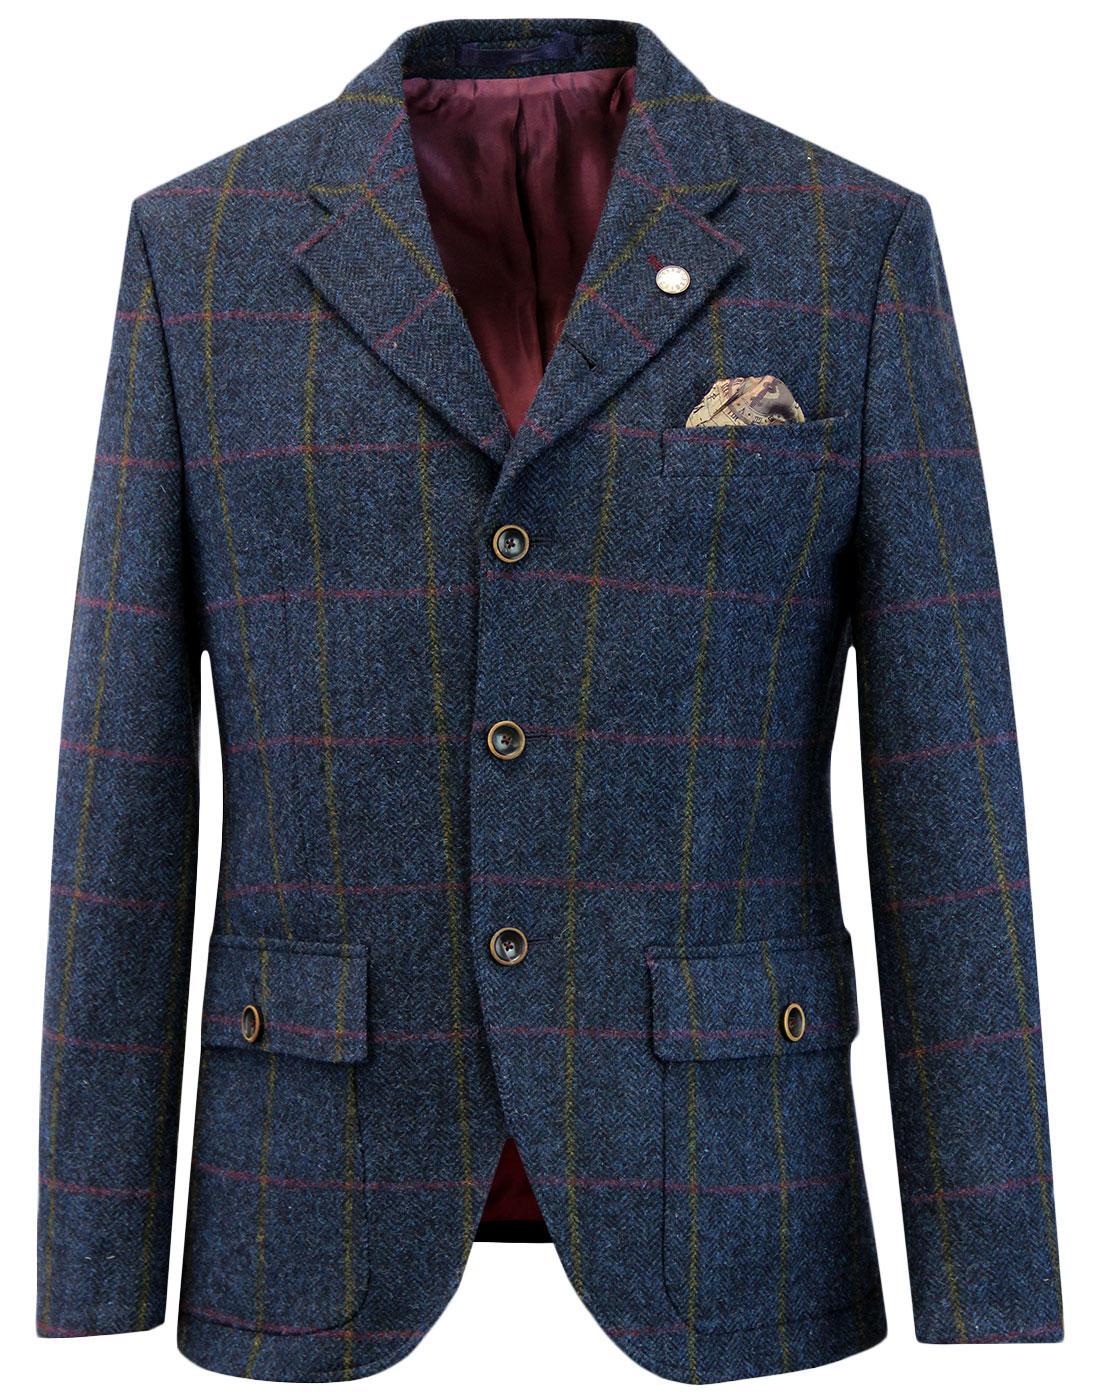 Grouse GIBSON LONDON Herringbone Check Blazer (N)